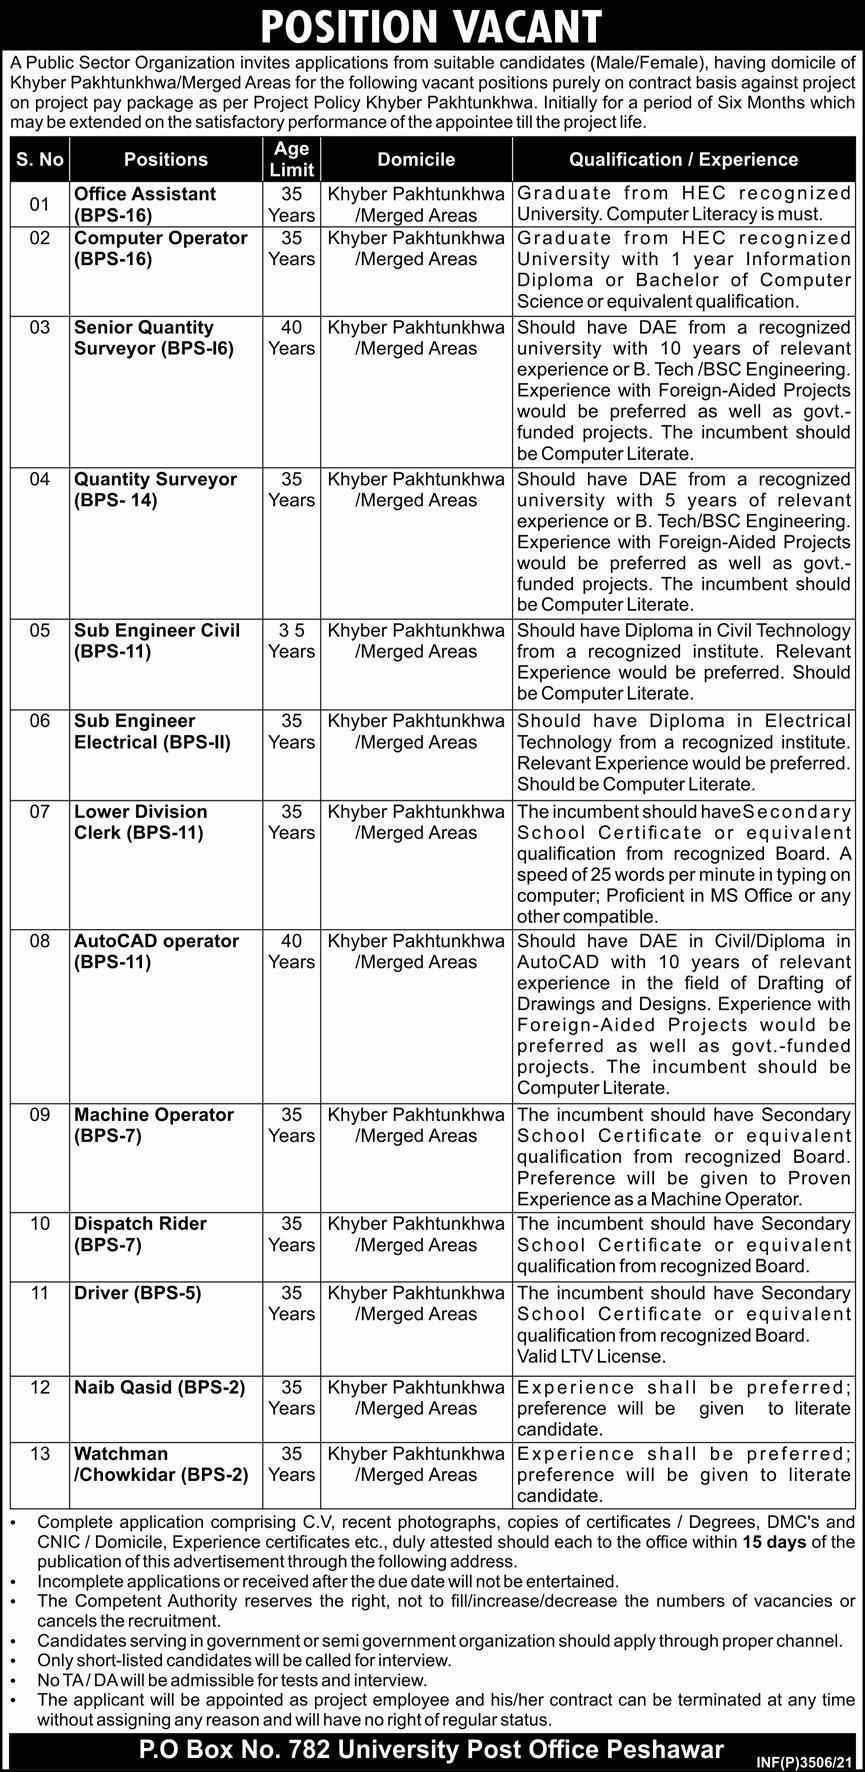 Public Sector Organization Management Jobs 2021